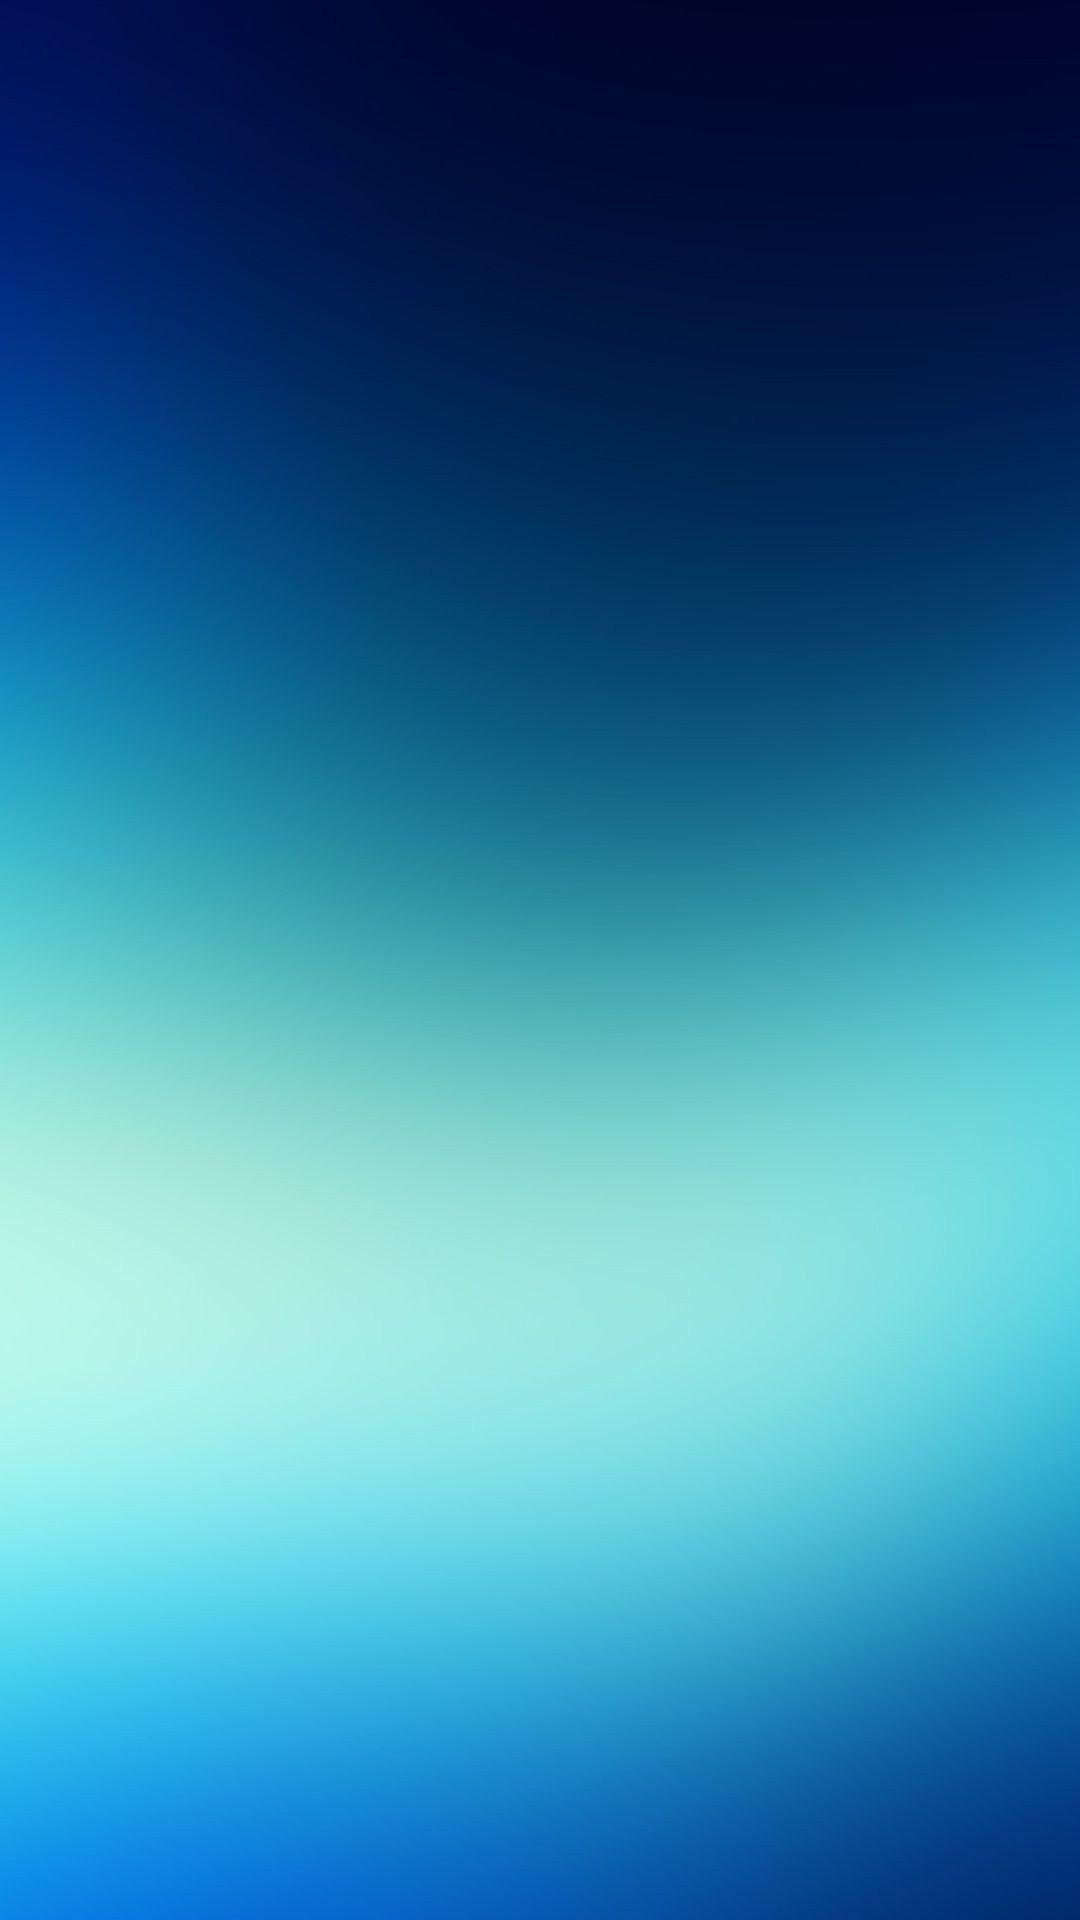 1080x1920, Blue Blur Iphone 6 Plus Wallpaper - Blue Wallpaper Iphone - HD Wallpaper